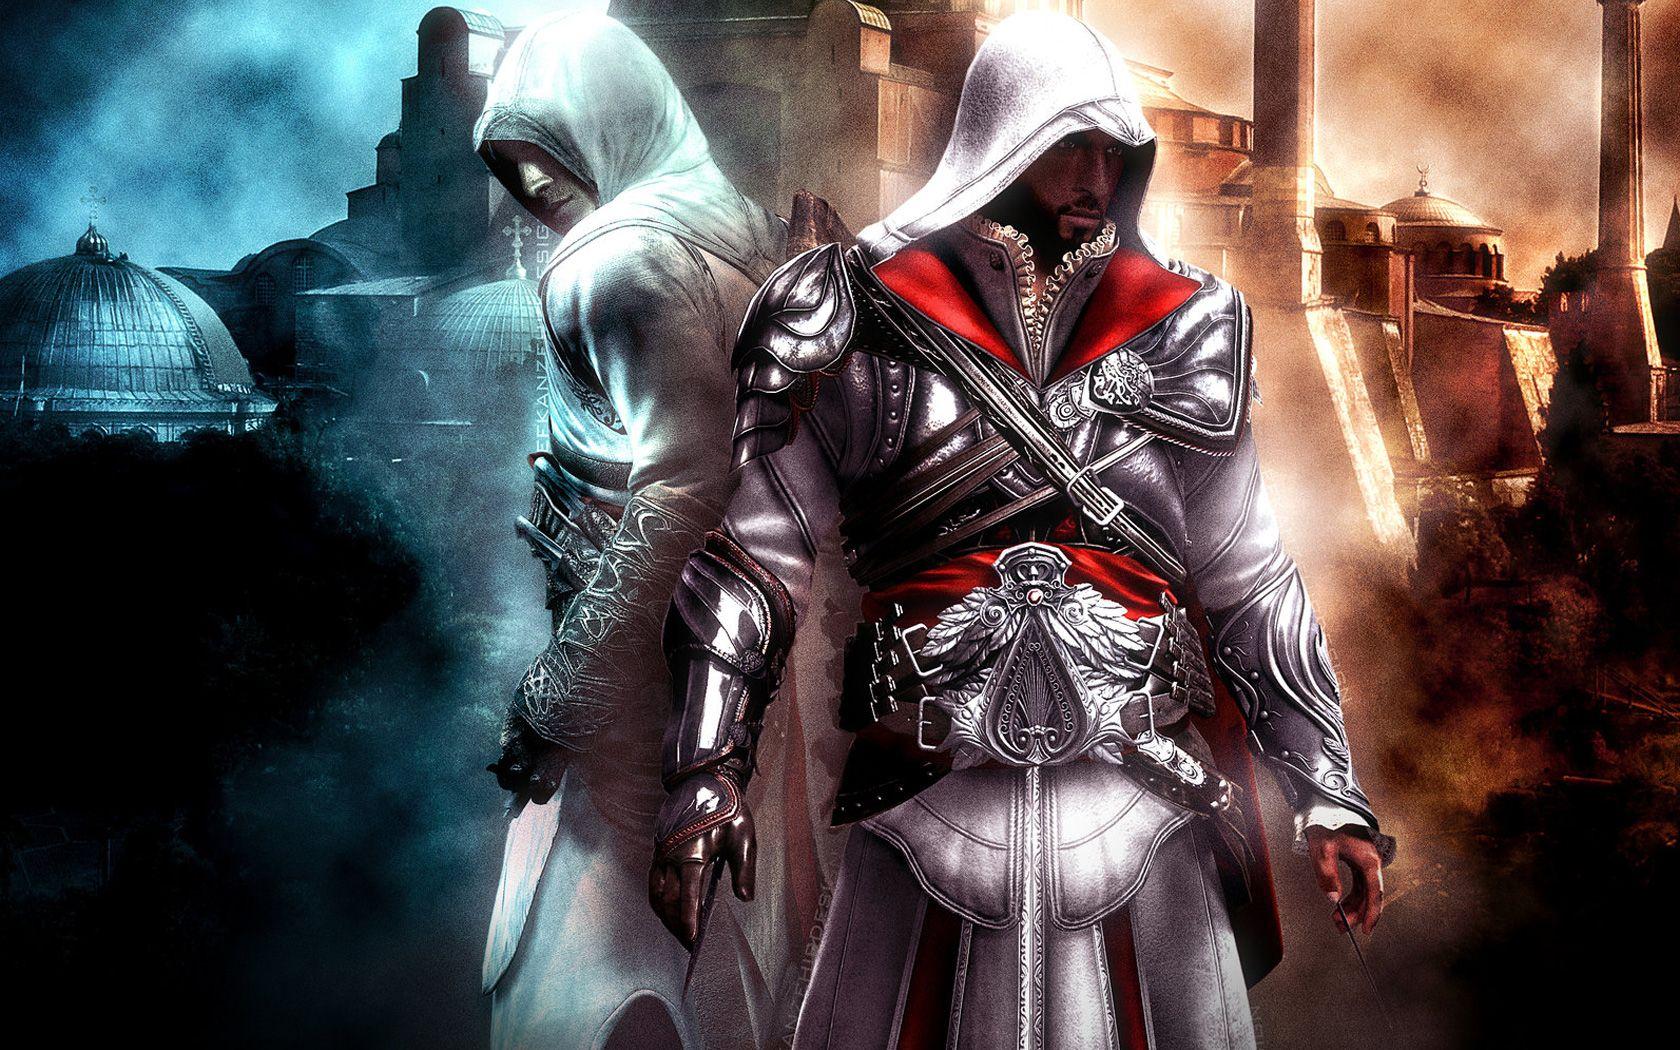 Wallpaper Assassins Creed Revelations HD Wallpapers